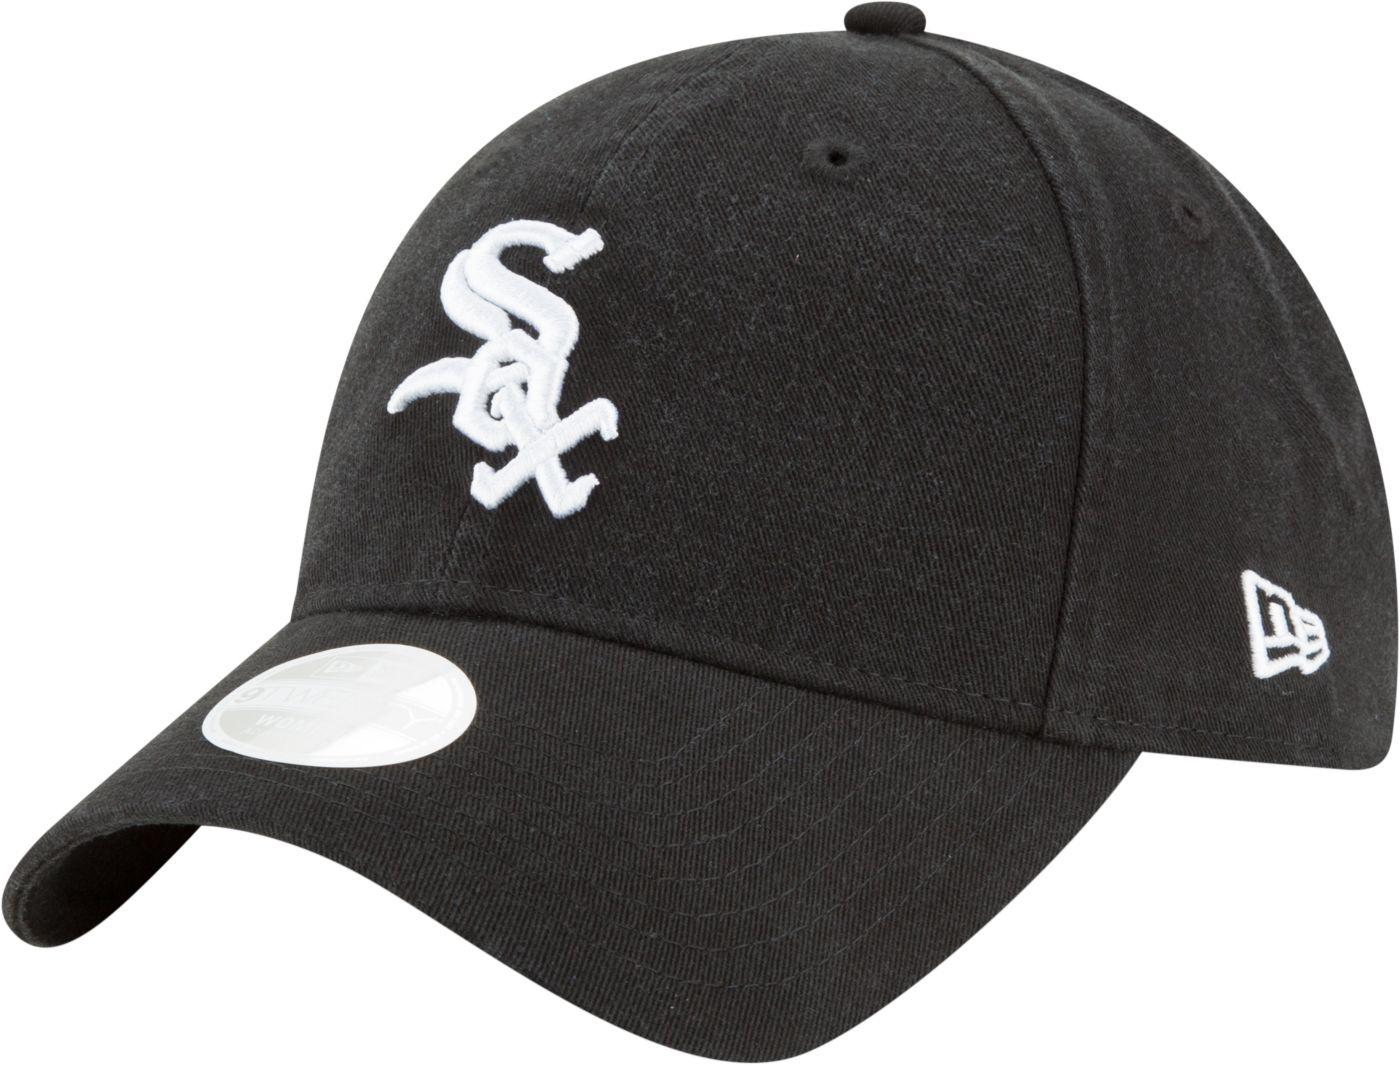 New Era Women's Chicago White Sox 9Twenty Adjustable Hat